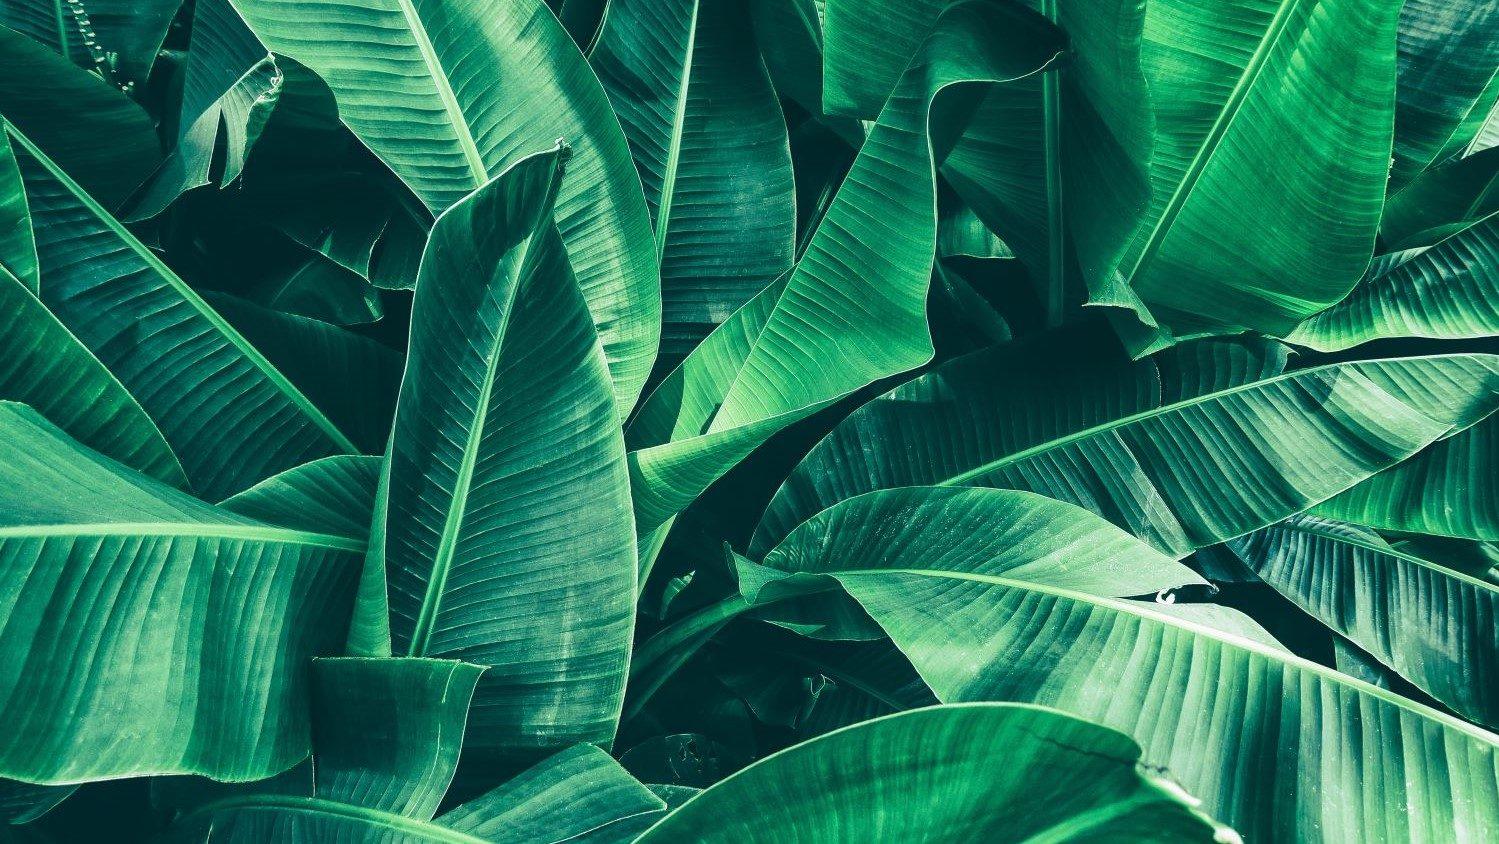 Love the nature – Alles im grünen Bereich?